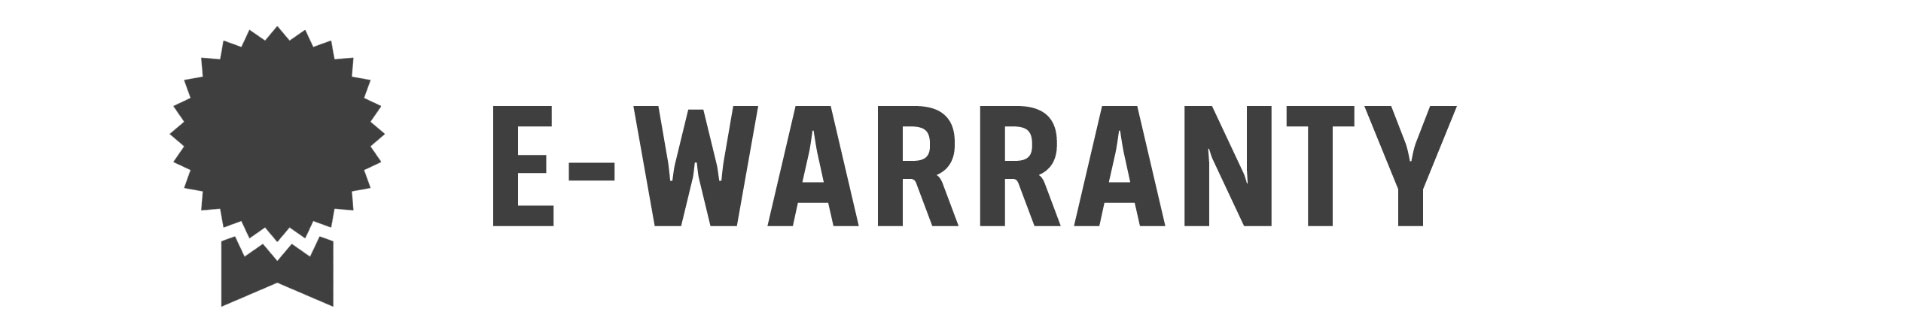 E-Warranty